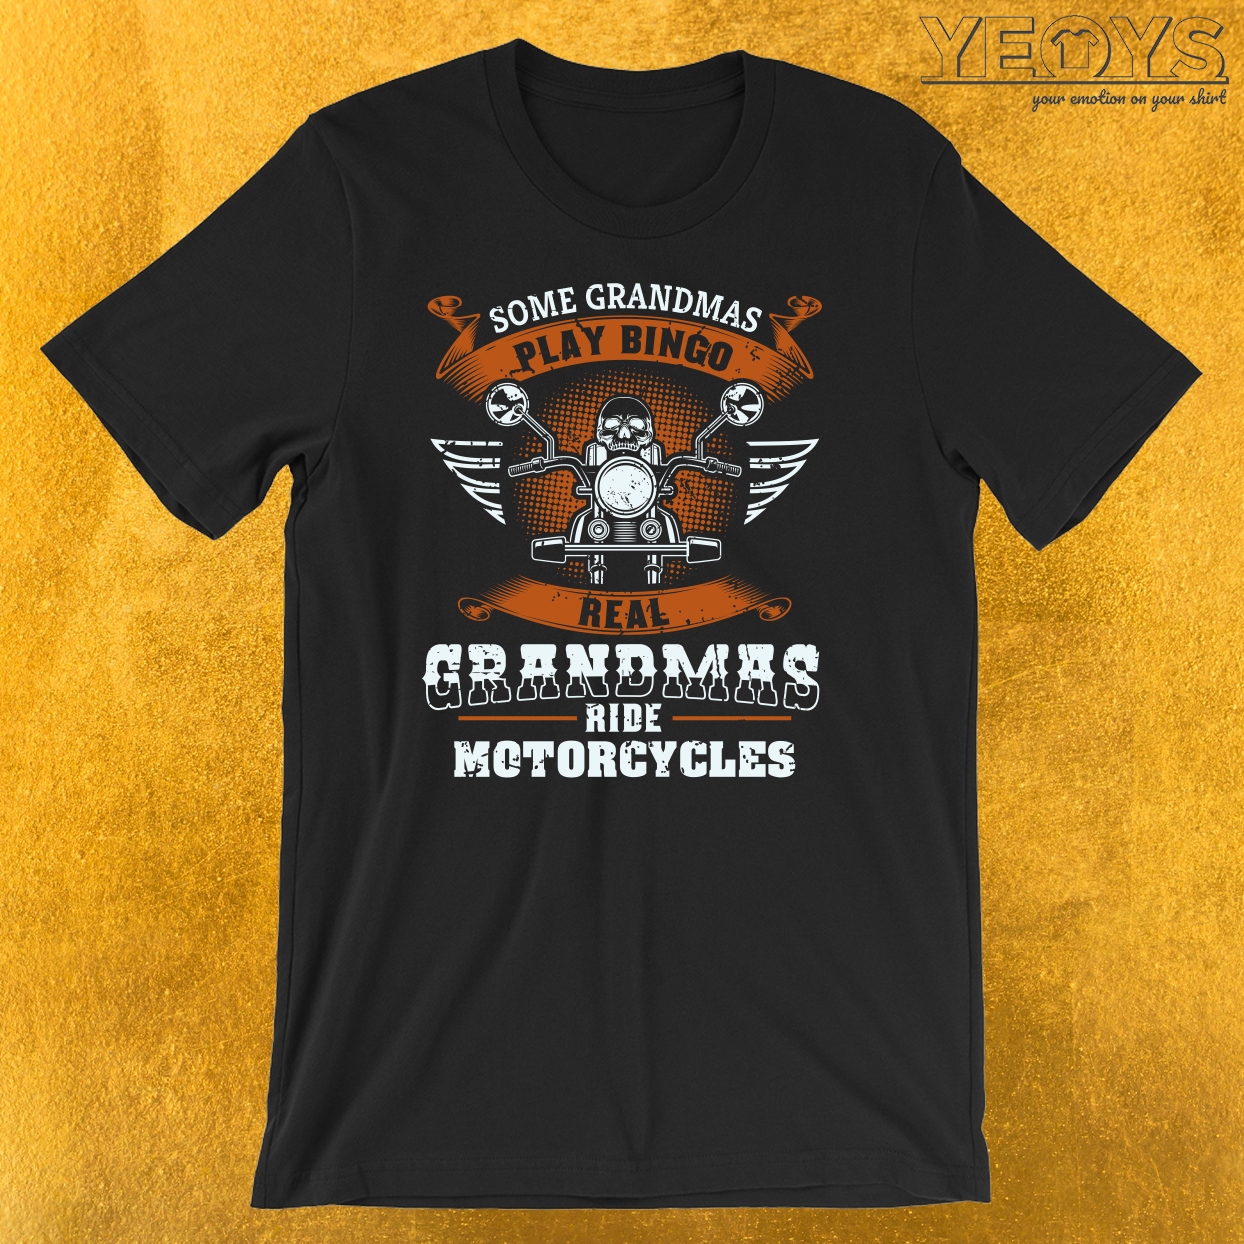 Some Grandmas Play Bingo Real Ride Motorcycles T-Shirt